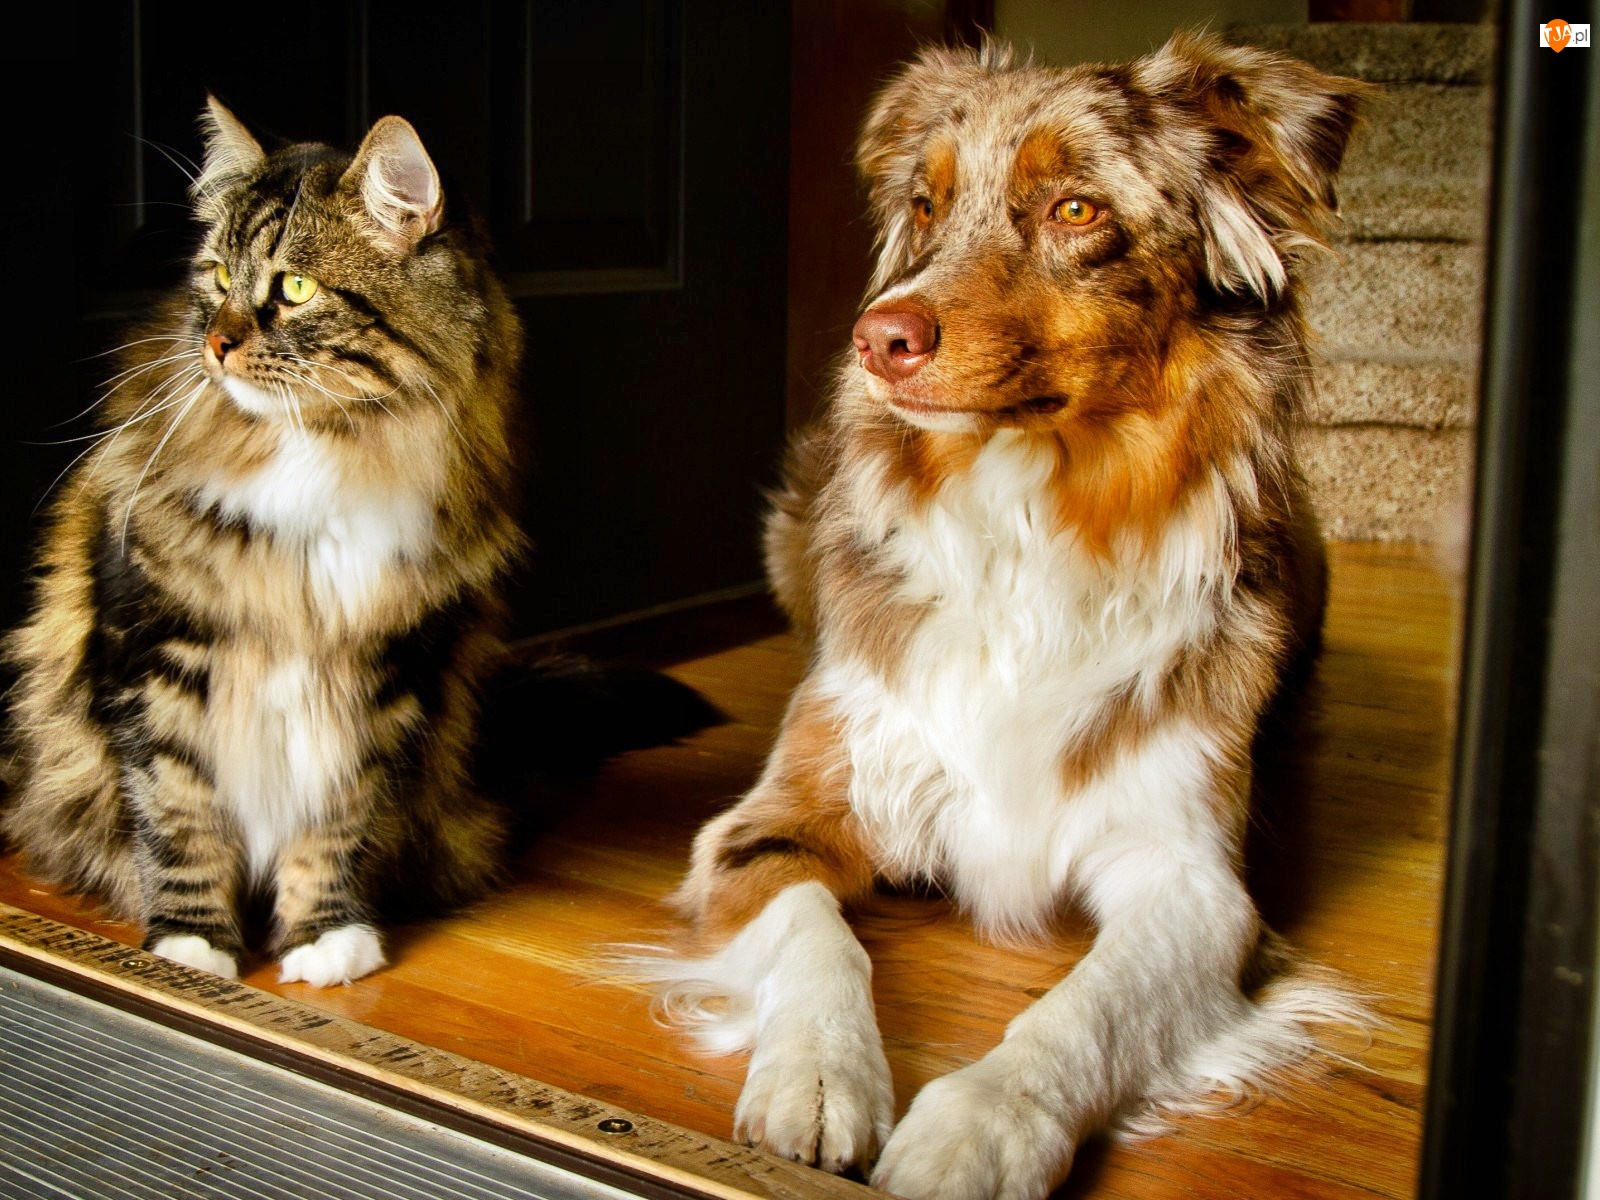 Kot, Australian shepherd, Pies, Owczarek australijski